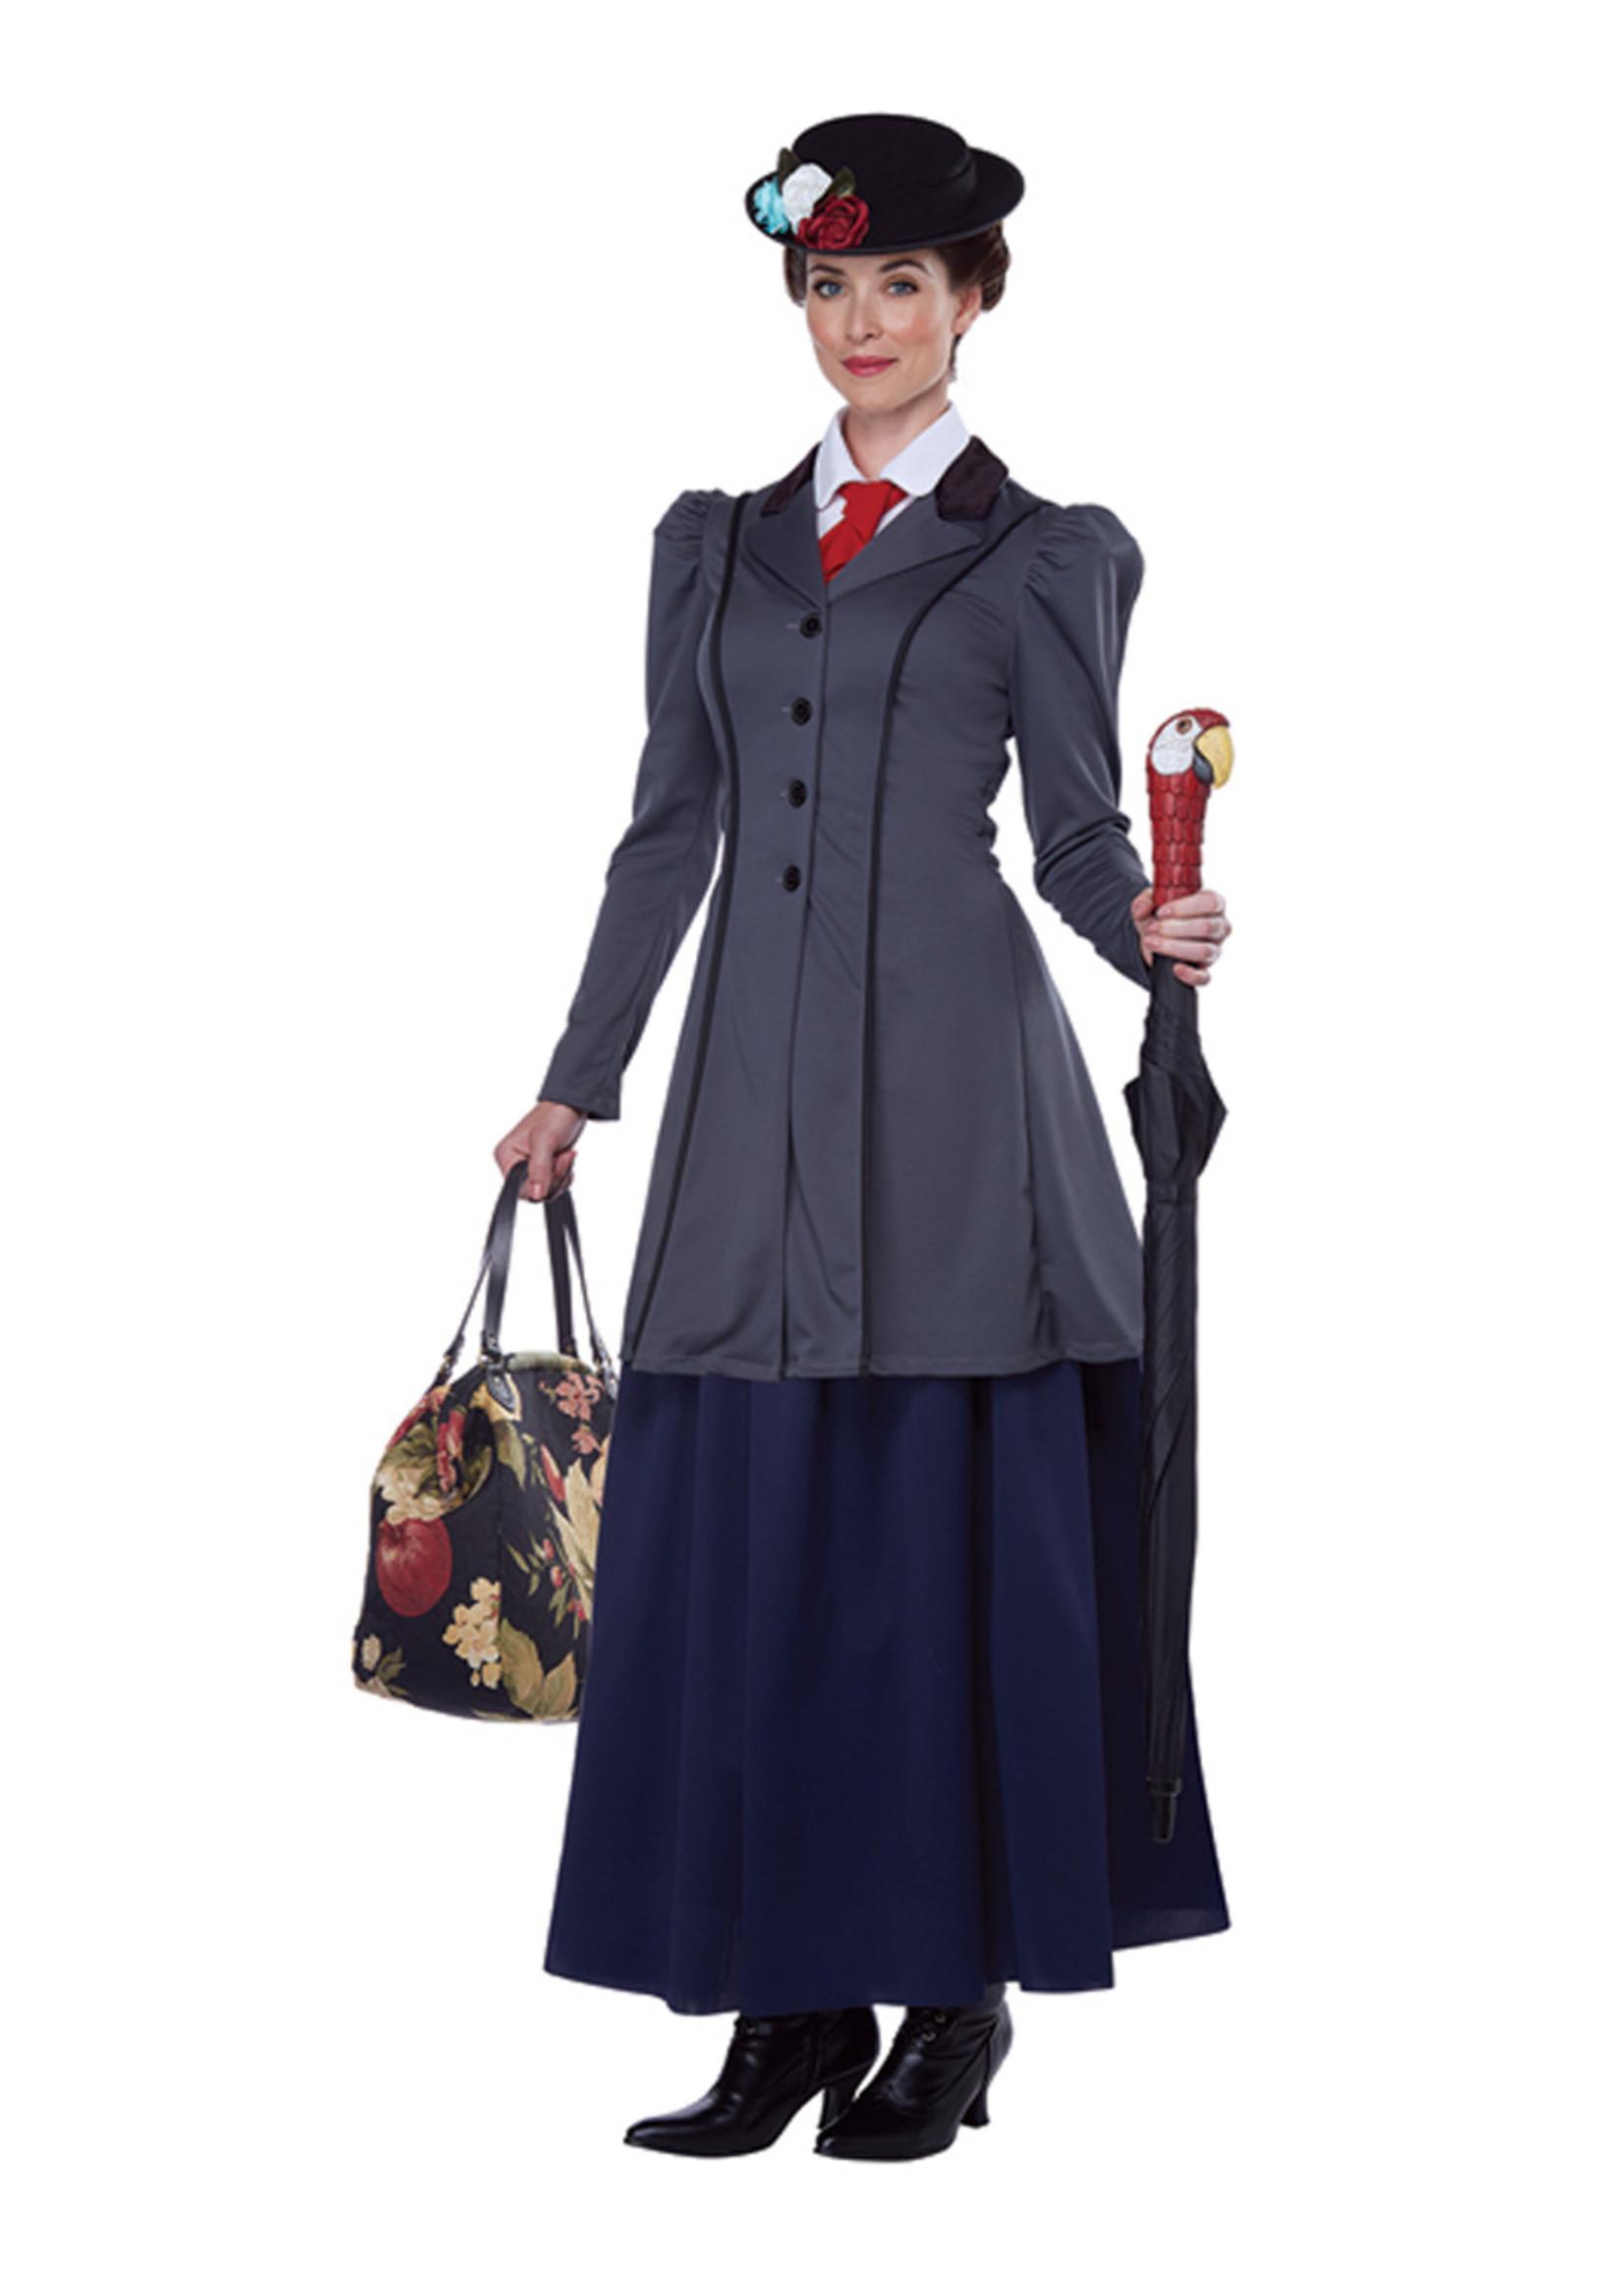 English Nanny Costume - Women's